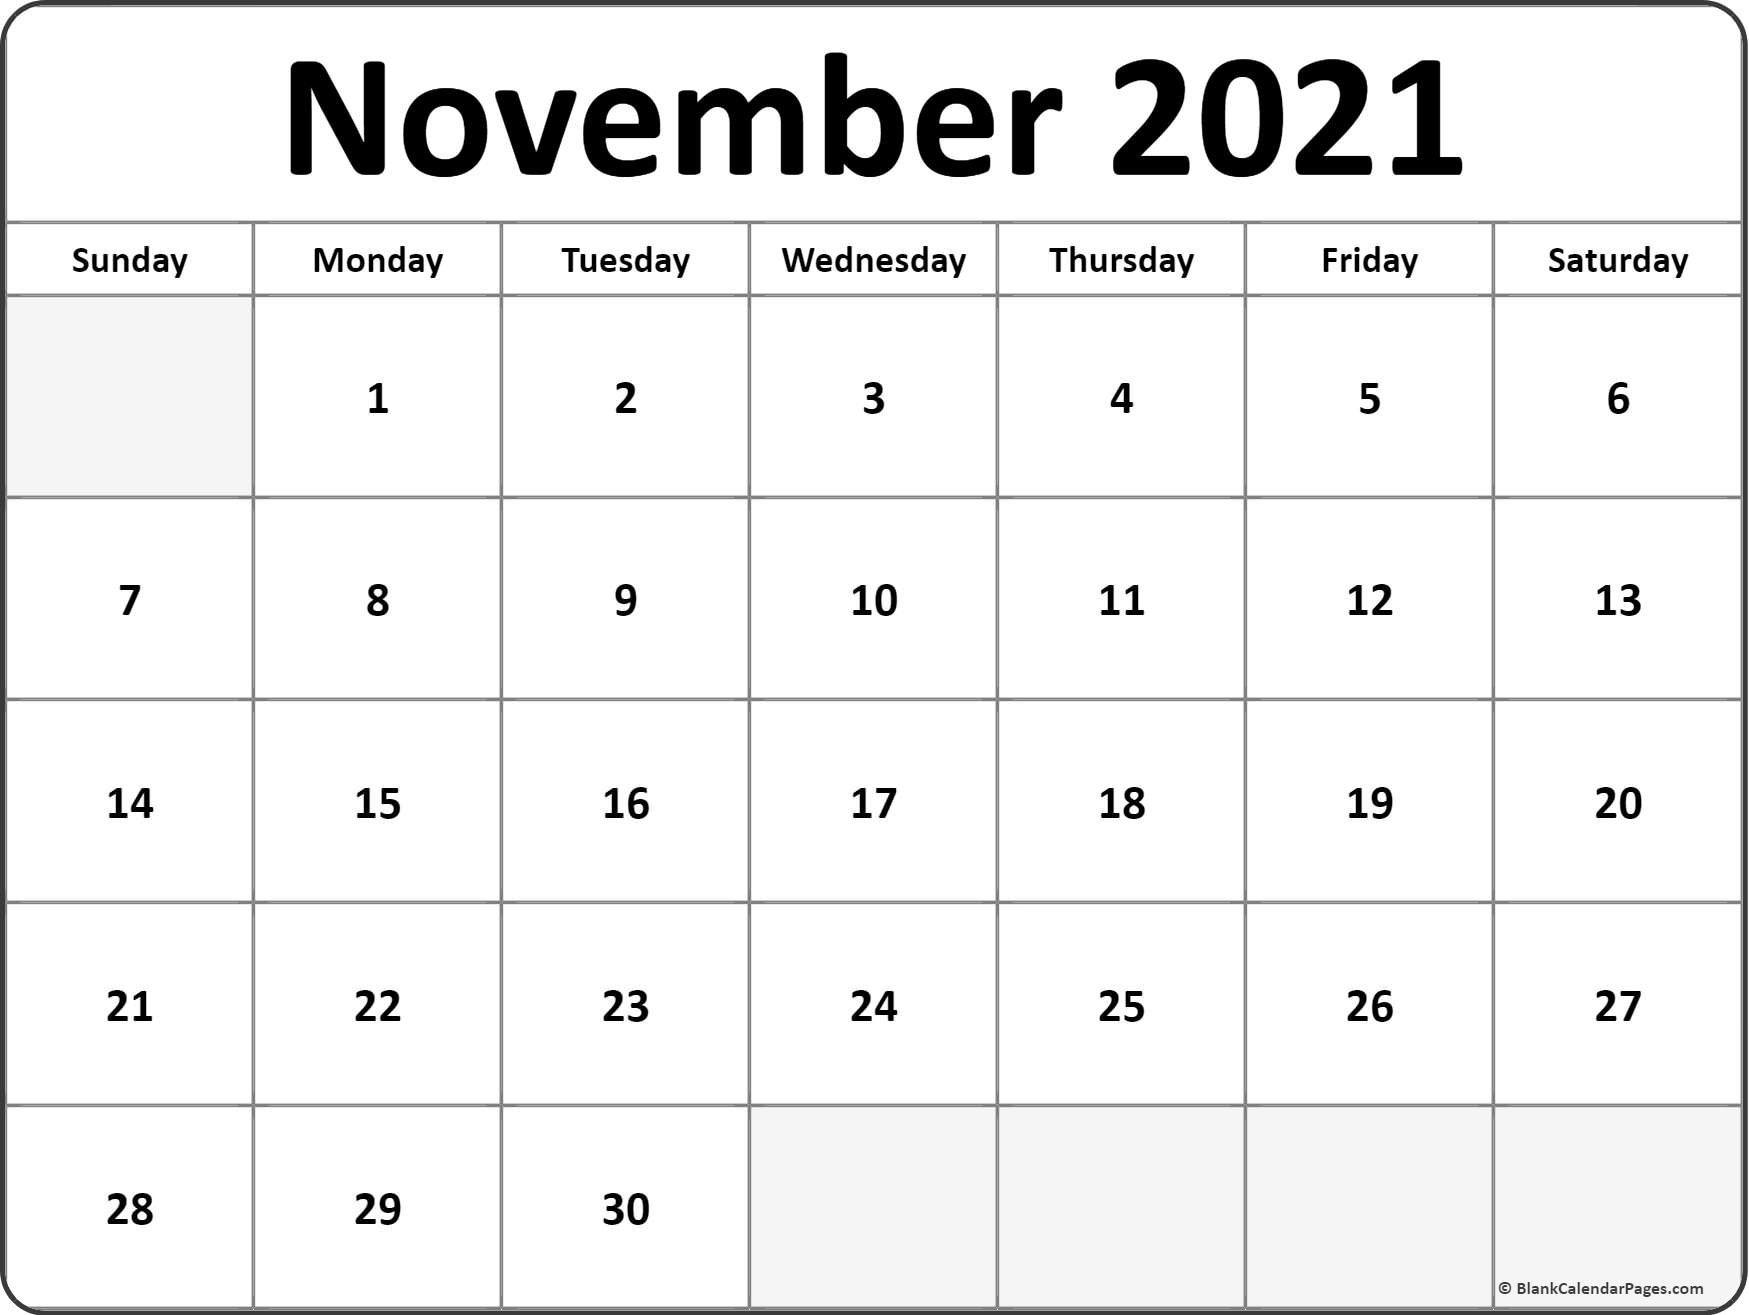 2021 Printable Monthly Calendar   Ten Free Printable Calendar 2020-2021 within Free Calendar Template 2021 Printable With Lines Image